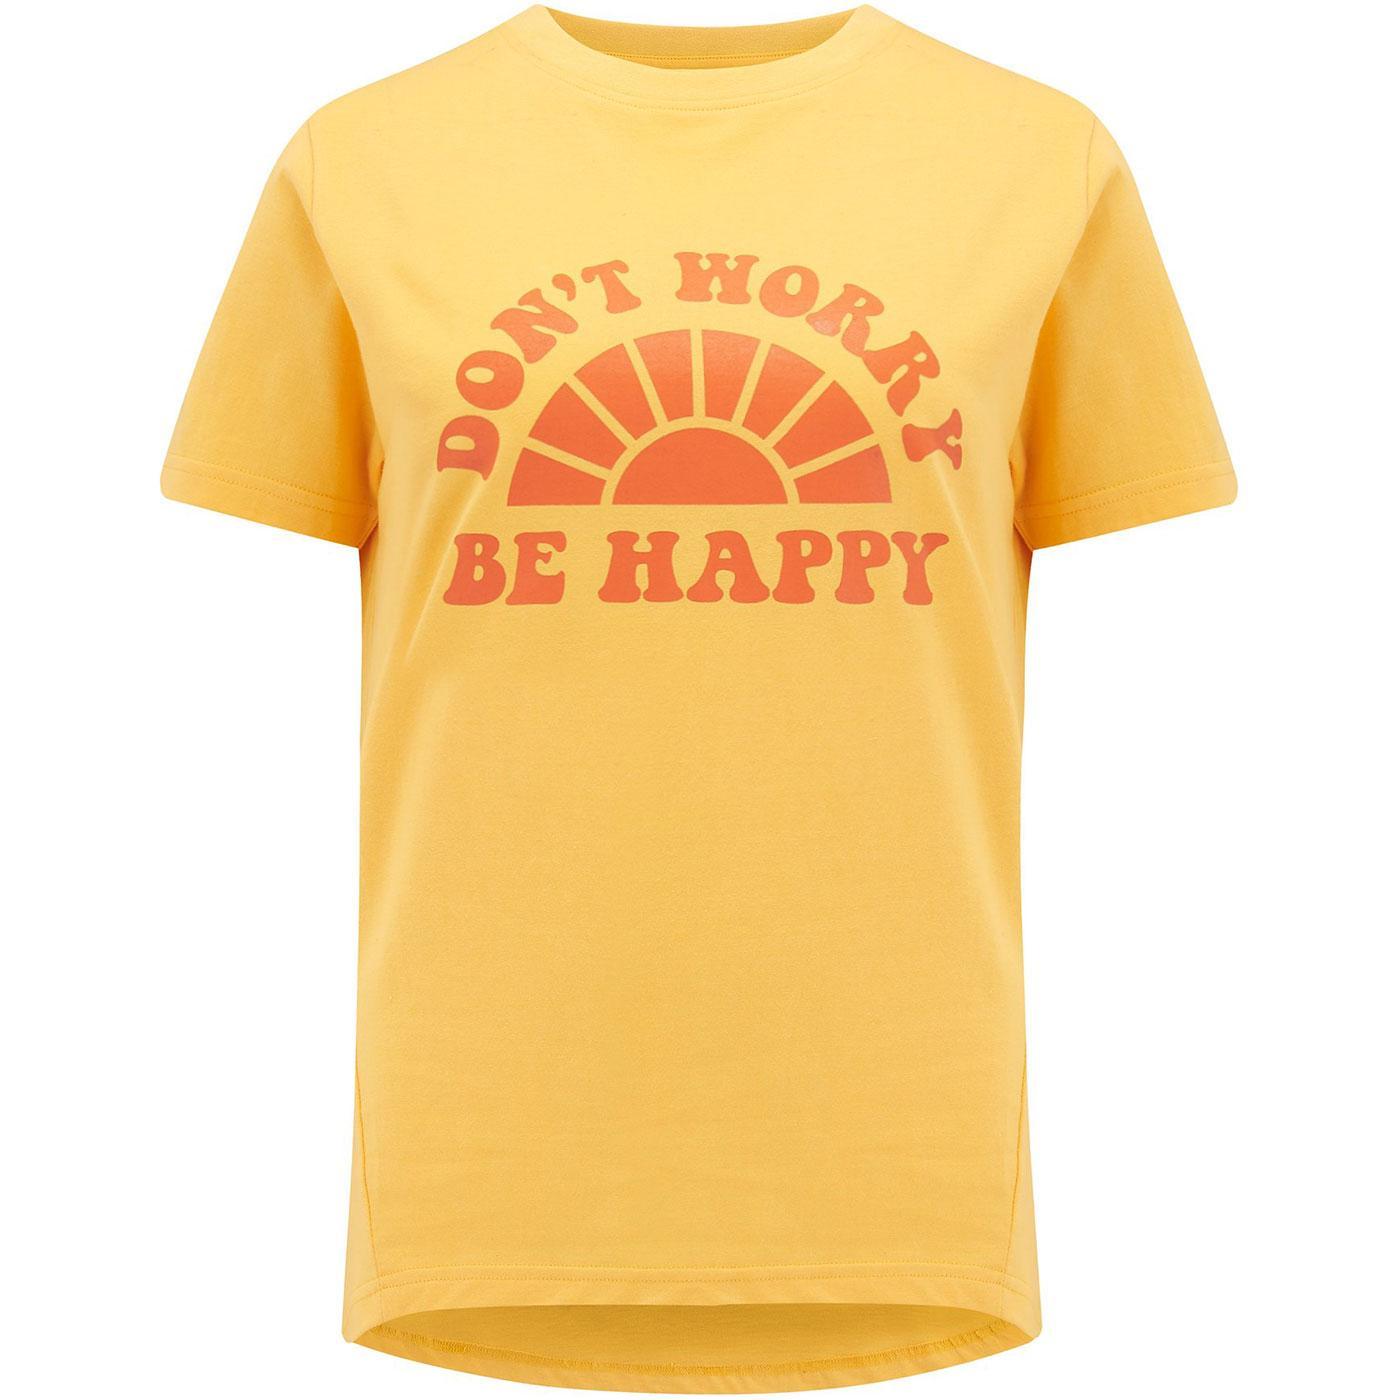 Mimi SUGARHILL BRIGHTON Don't Worry Be Happy Tee